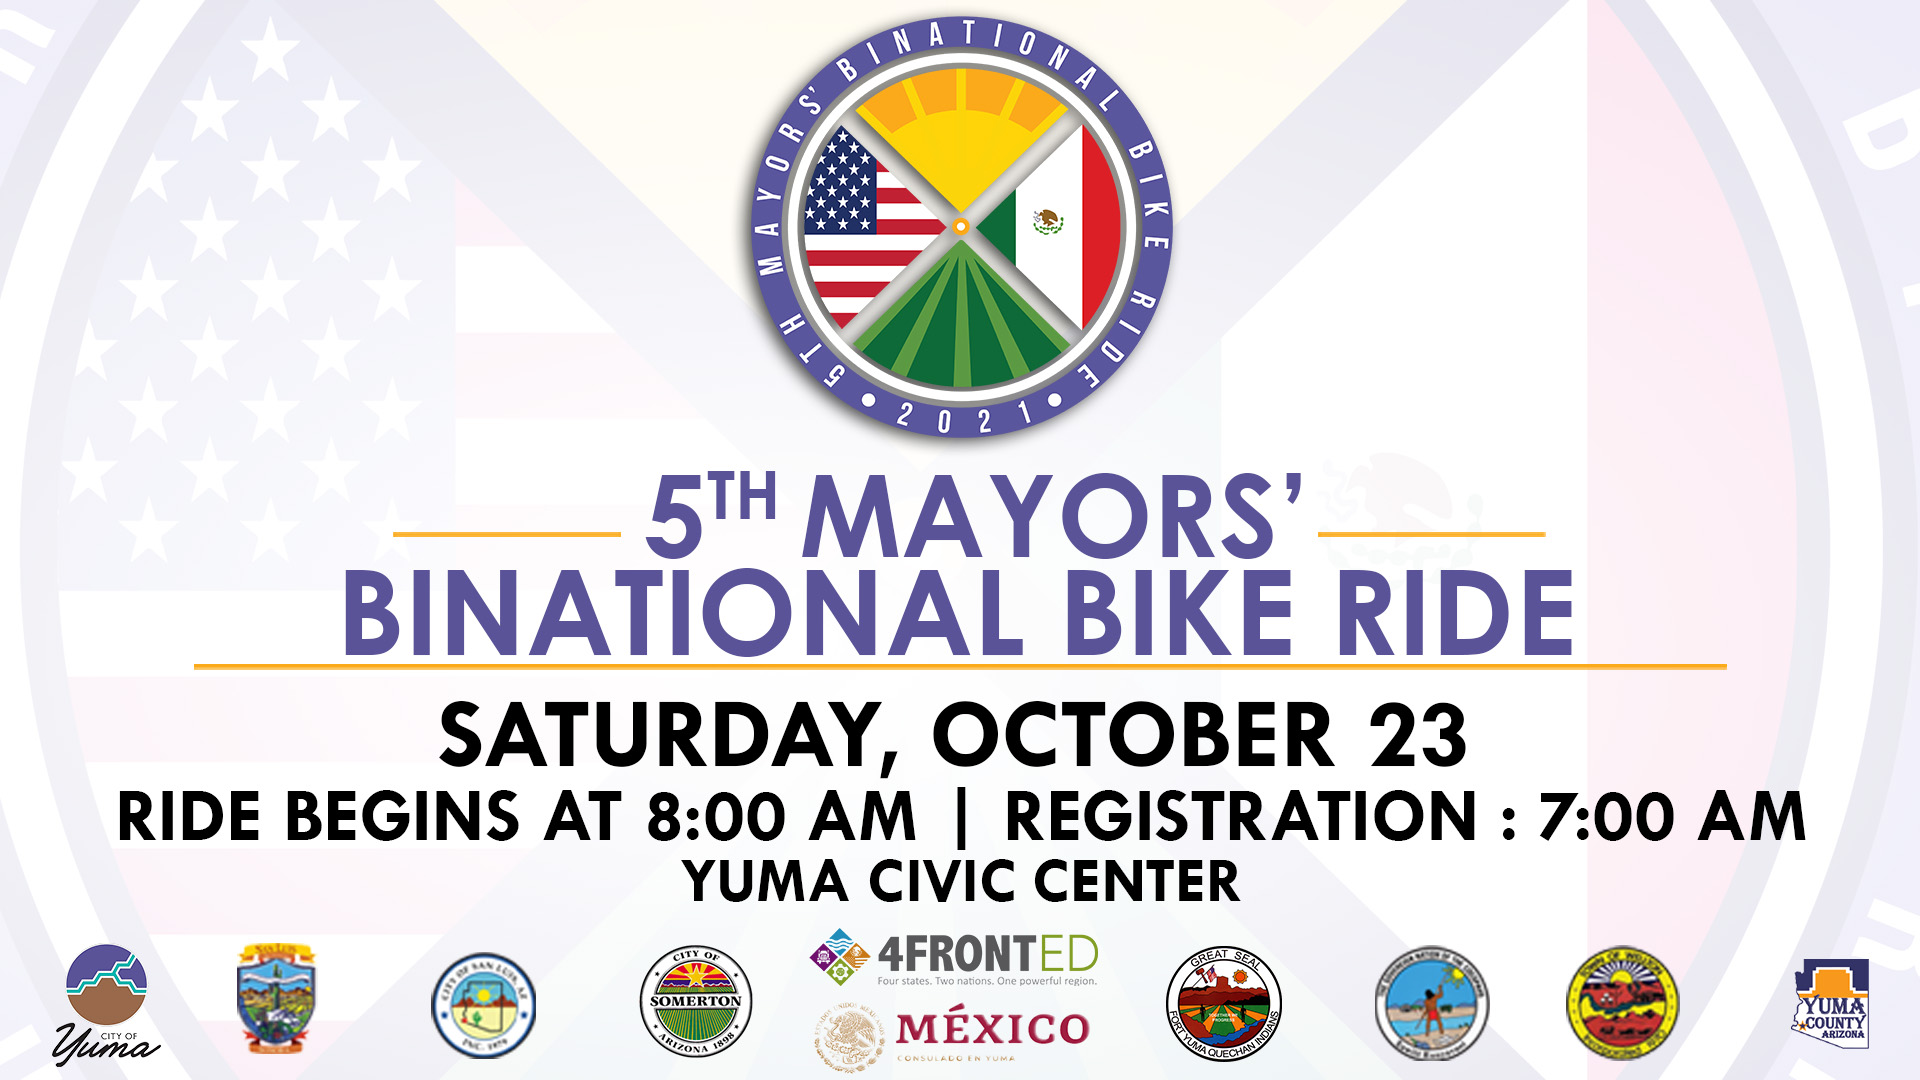 Mayors' binational bike ride